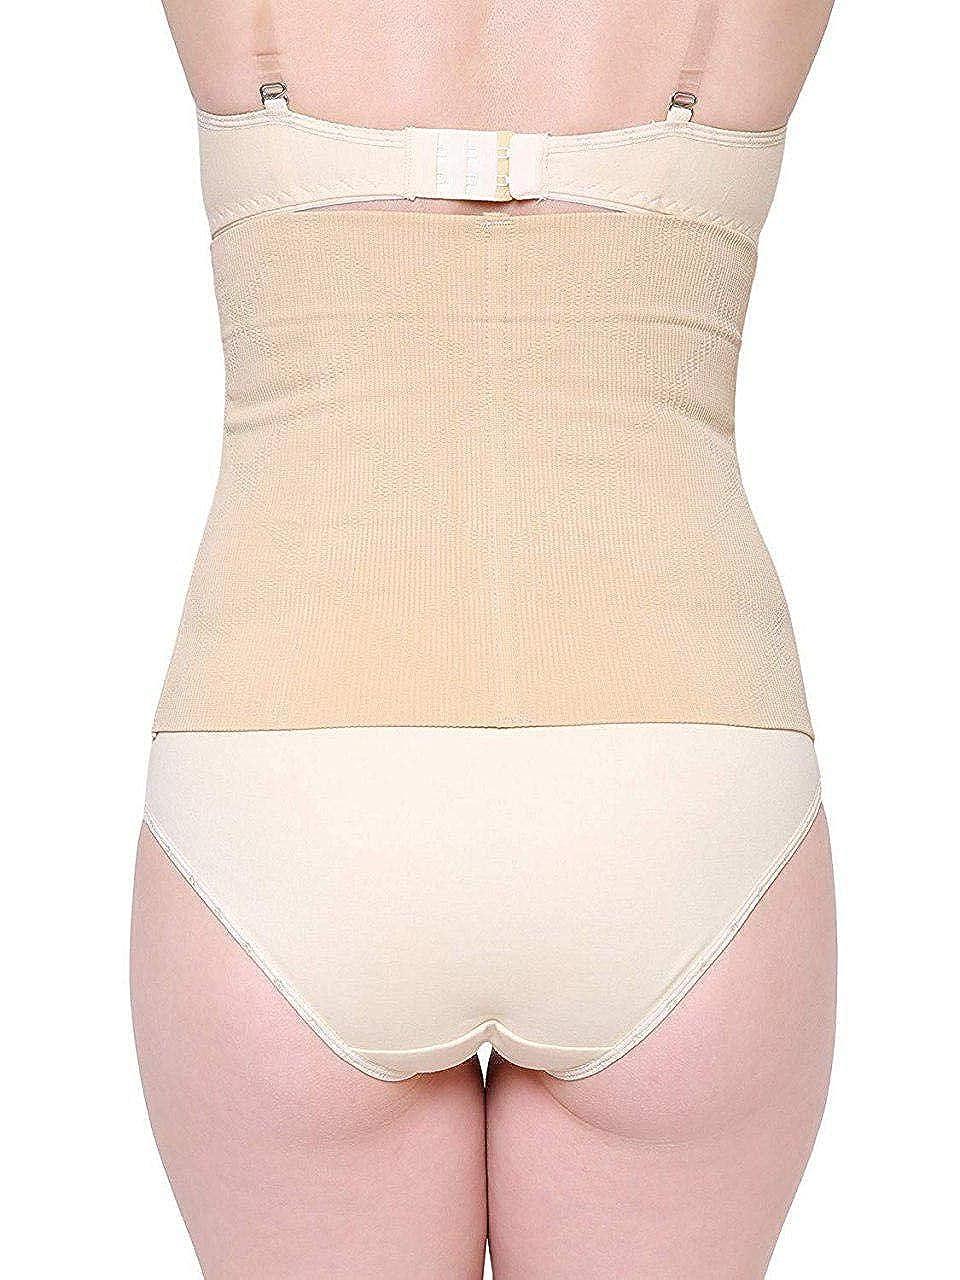 b0e9b0ac65 Women Innerwear Tummy shapers Tummy Trimmer Biege Corset Belt for Women  Body Shapewear Look Slim instantly No Roll Down  Amazon.in  Clothing    Accessories